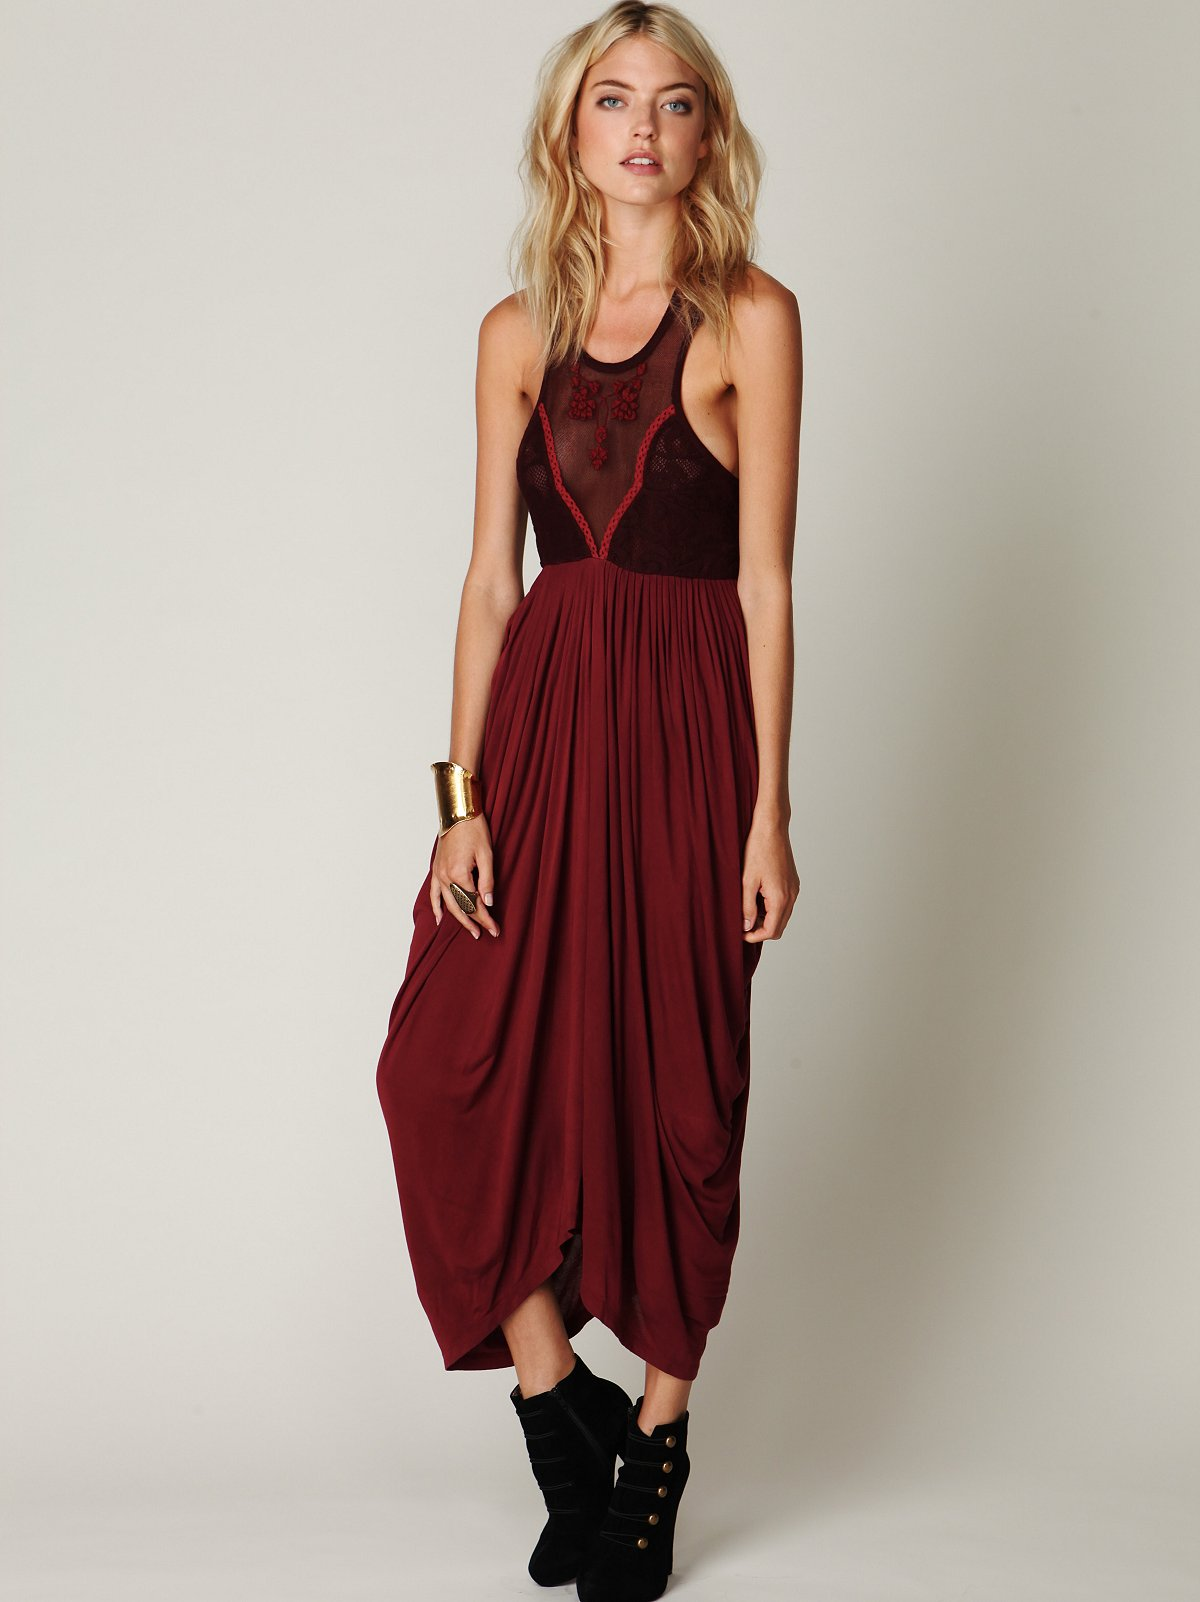 FP New Romantics Adriatic Queen Dress